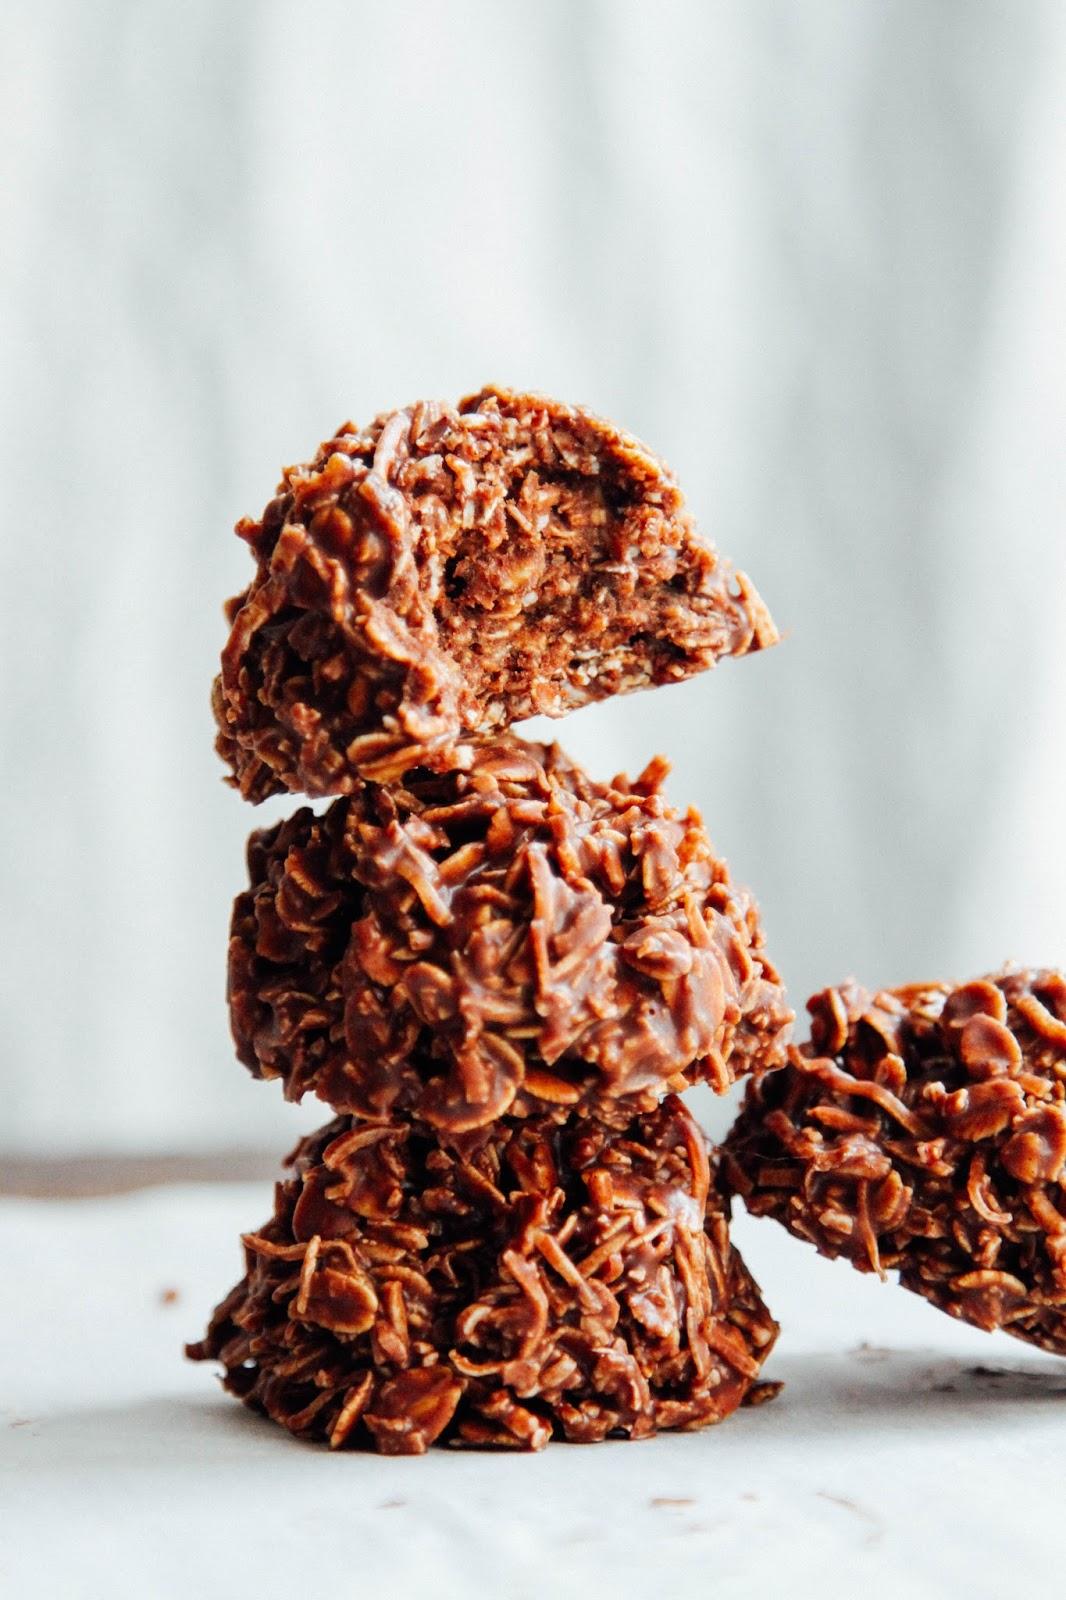 This Rawsome Vegan Life: CHOCOLATE MACAROONS (SUPER QUICK + EASY)